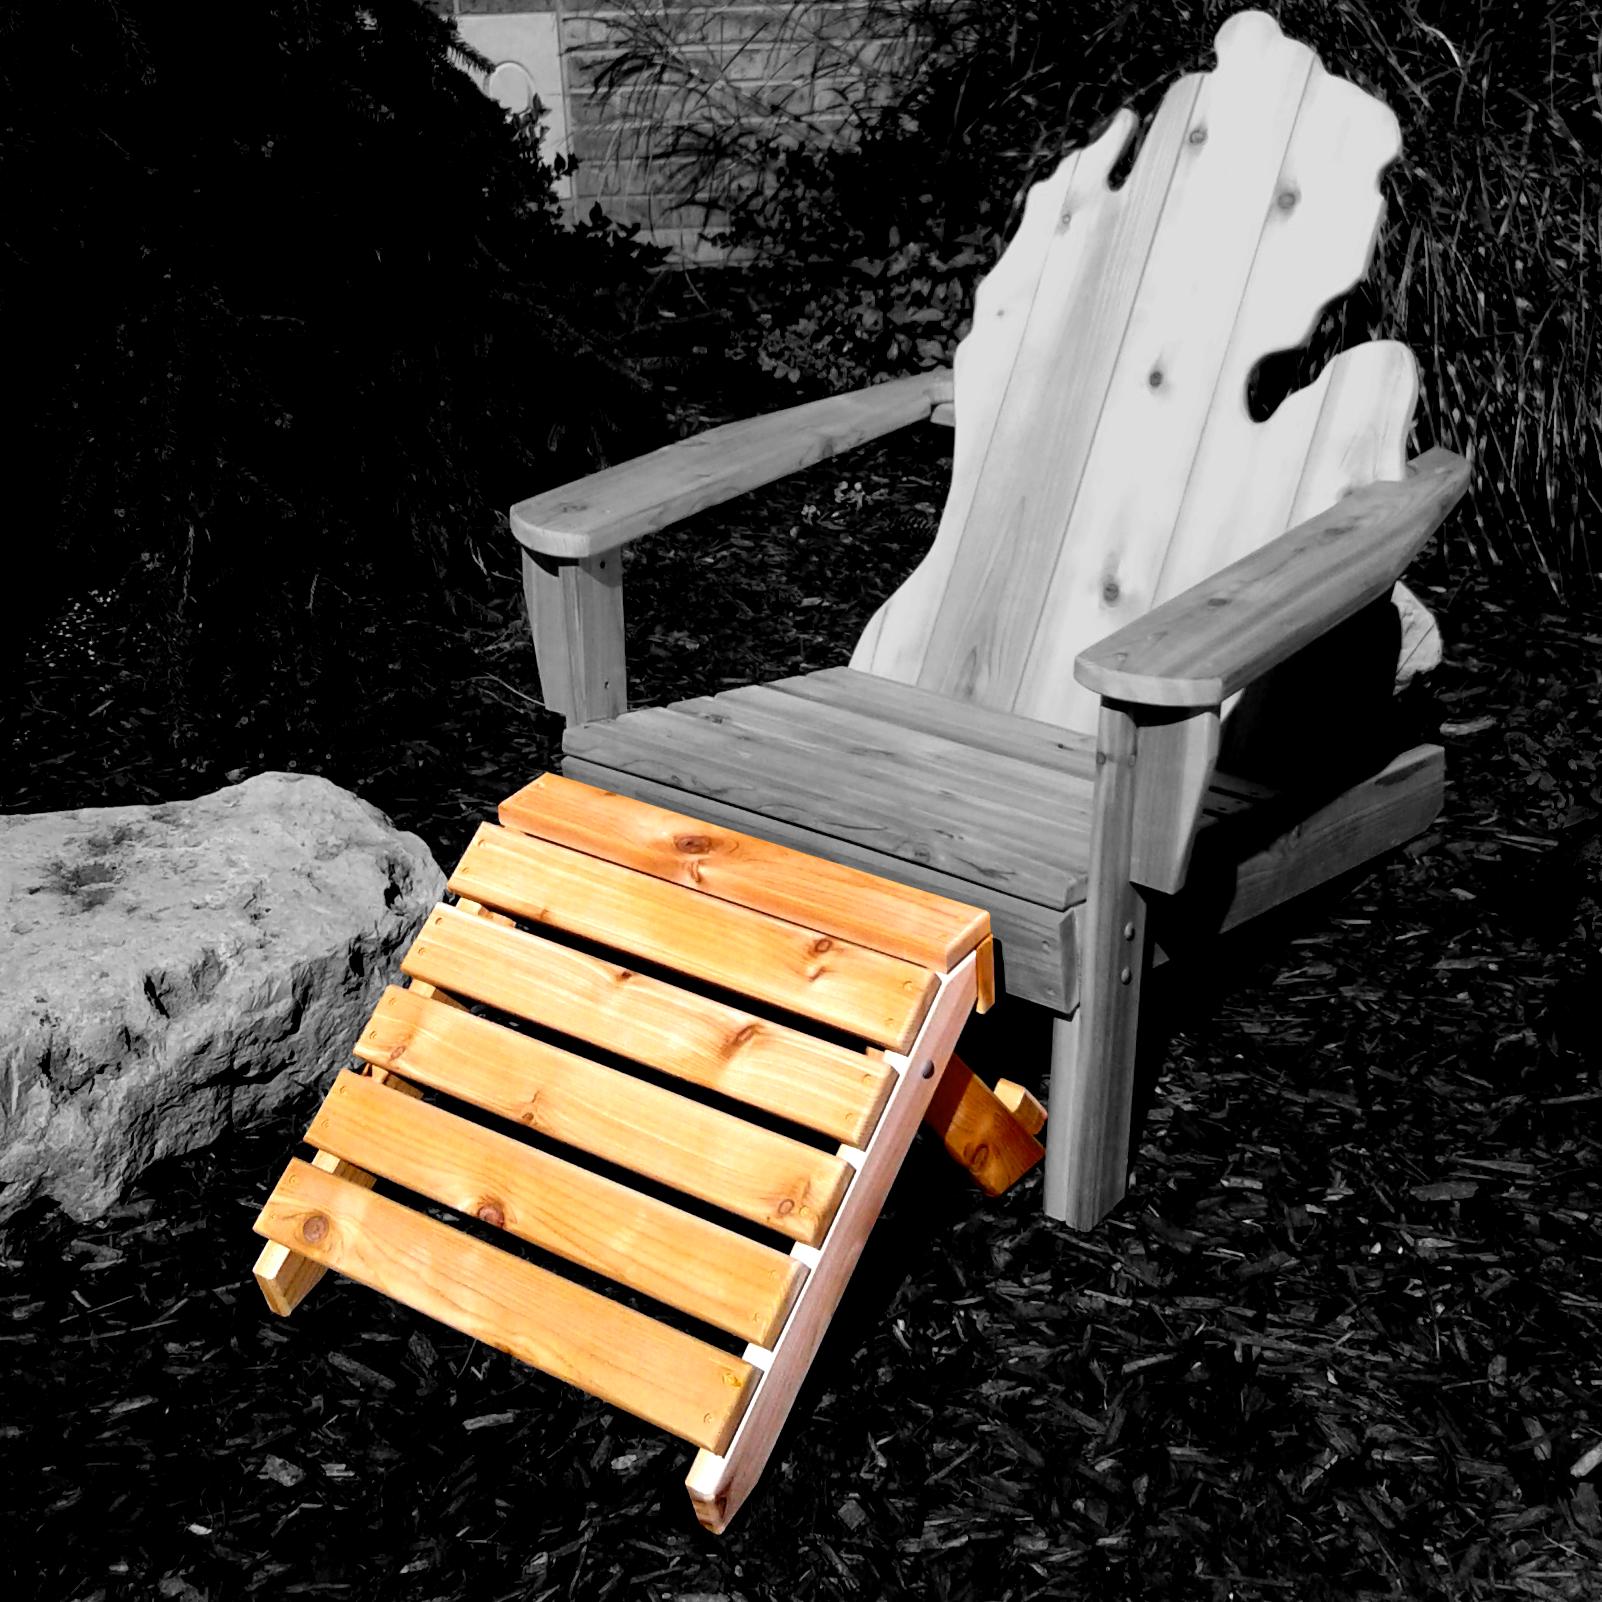 Footstool with Michigan Adirondack Chair